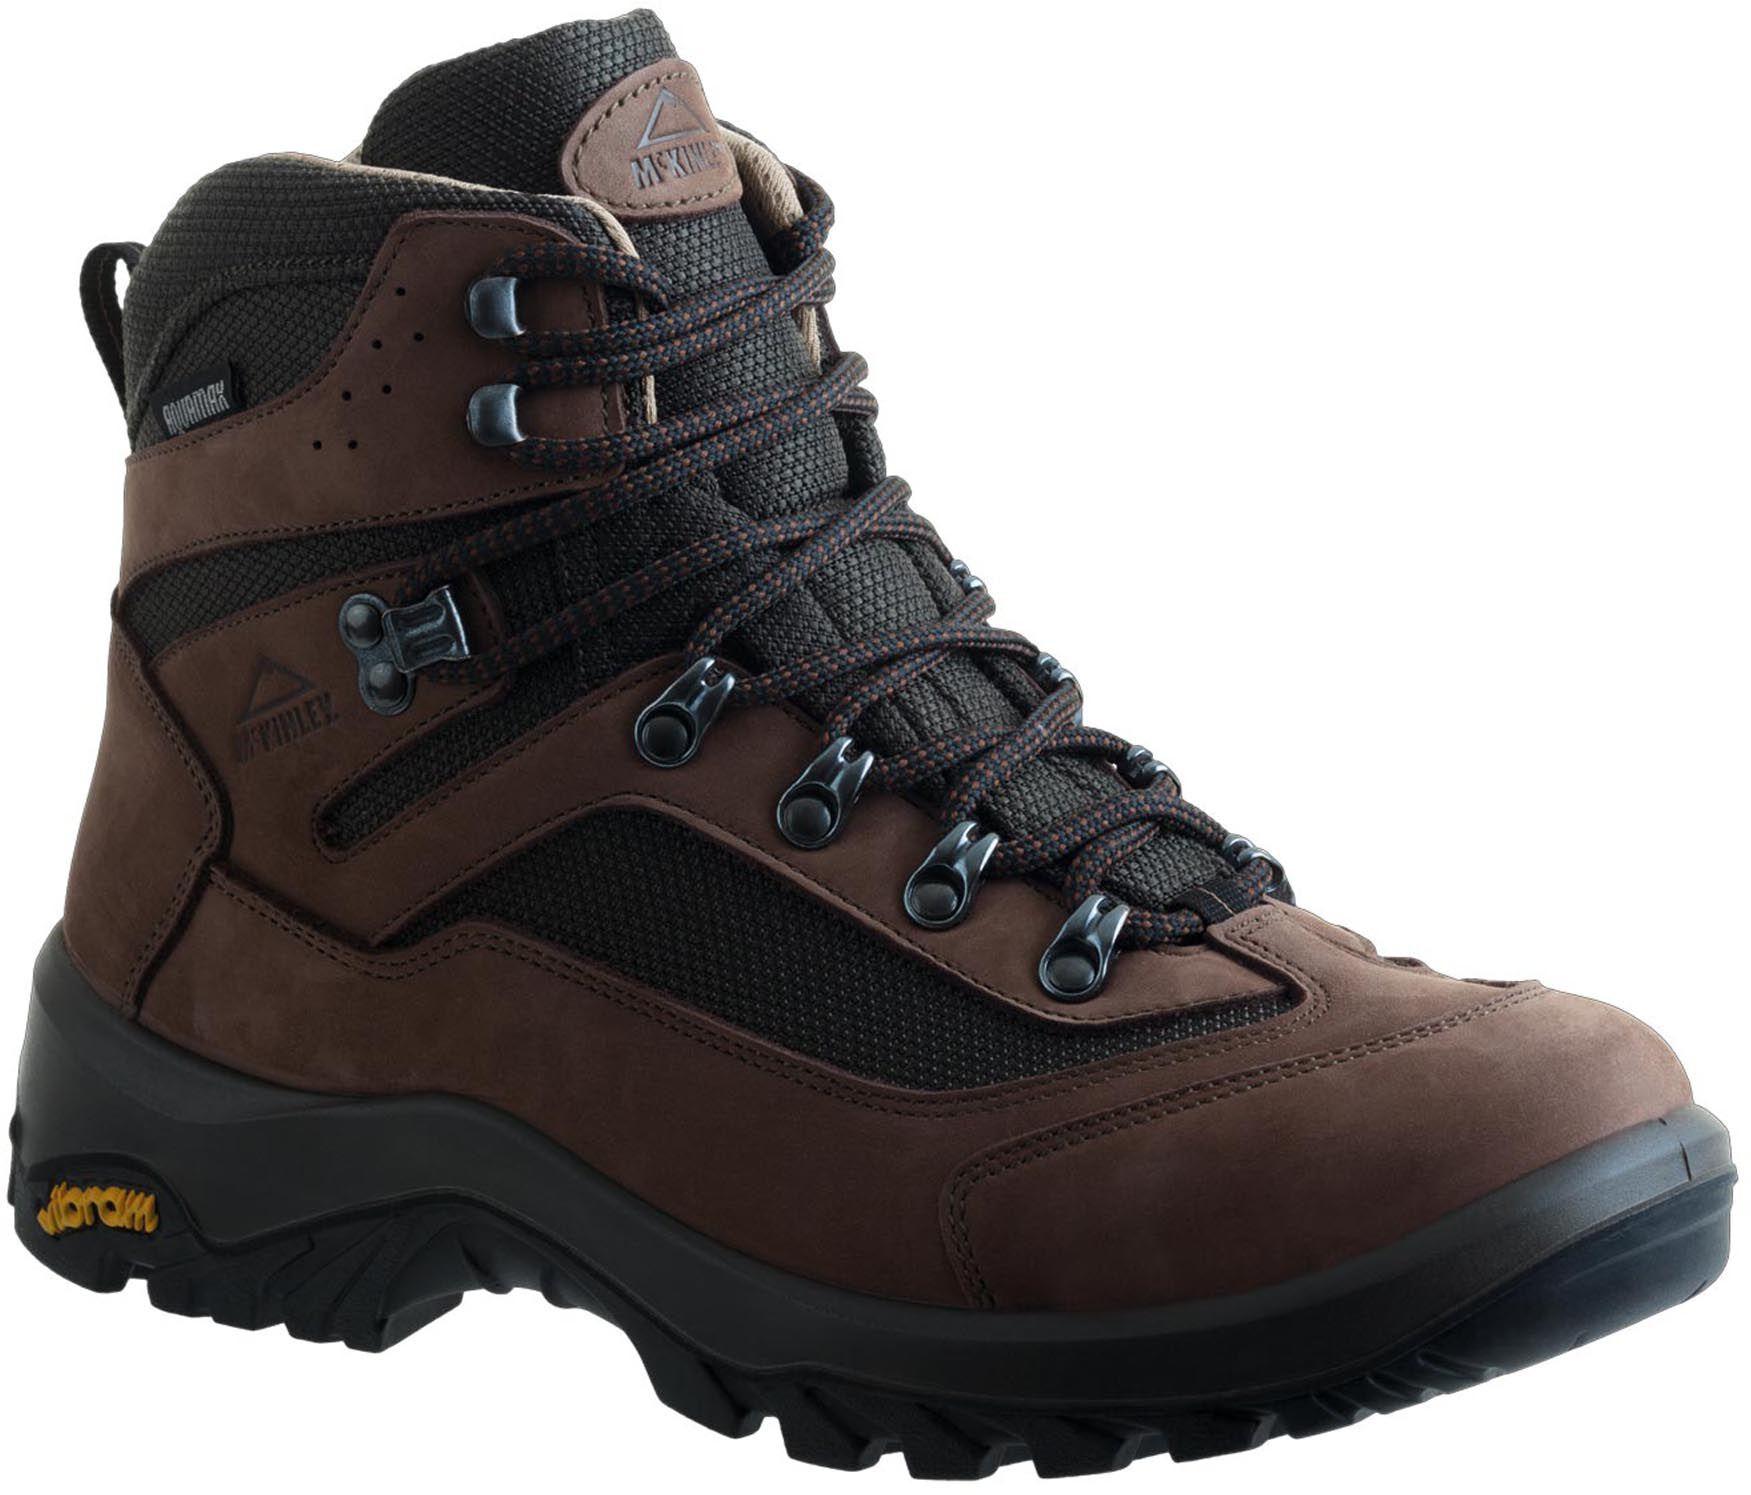 Mckinley - Chaussures De Marche Confort Voyage Aqx - Hommes - Chaussures - Gris - 41 v9tyJjmtLZ